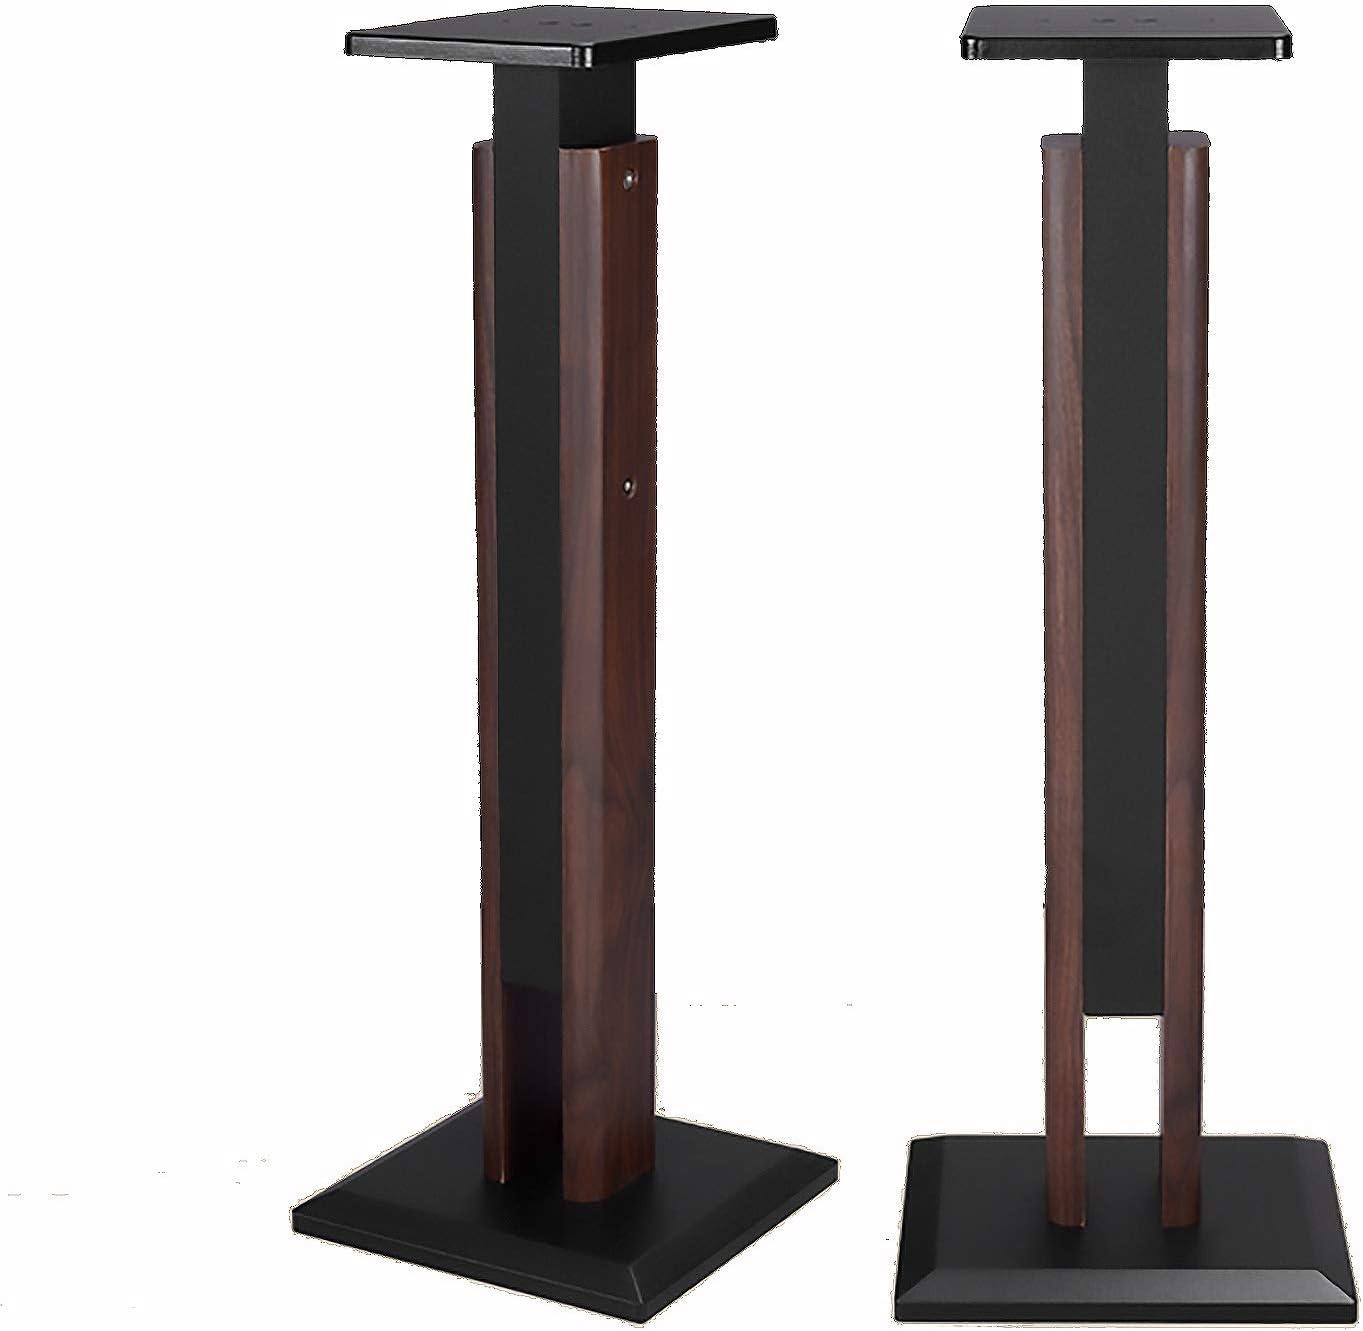 Max 88% OFF BXYXJ Walnut Speaker Stands - Height 65-88cm Adjustment 95-120cm Selling